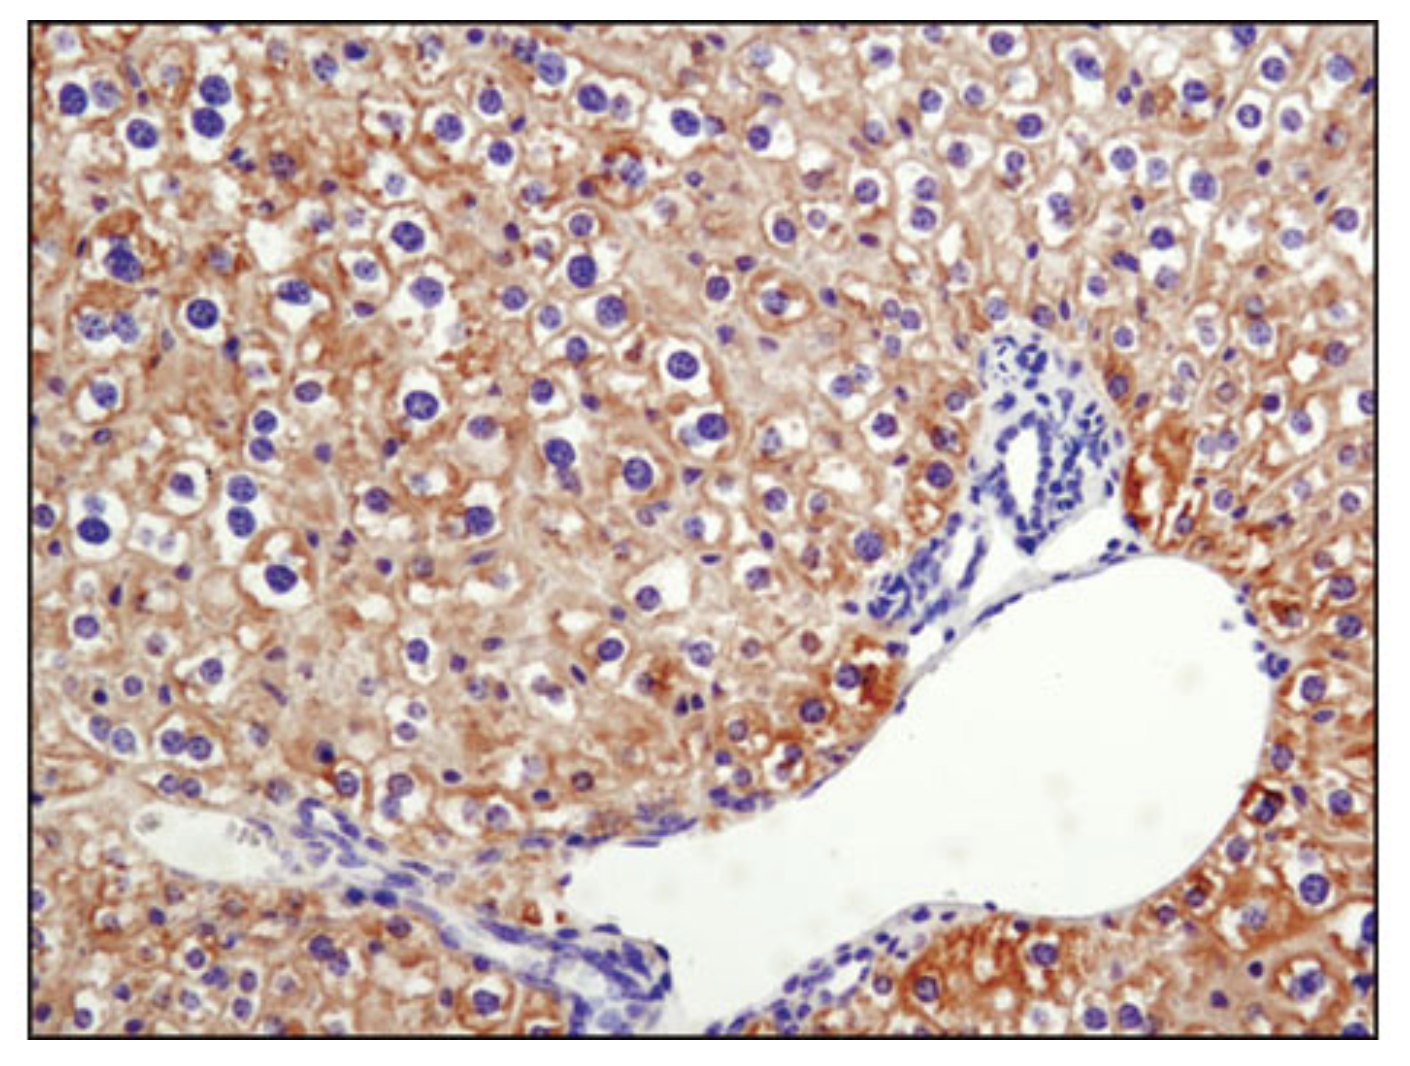 Phospho-Acetyl-CoA Carboxylase (Ser79) (D7D11) Rabbit mAb #11818